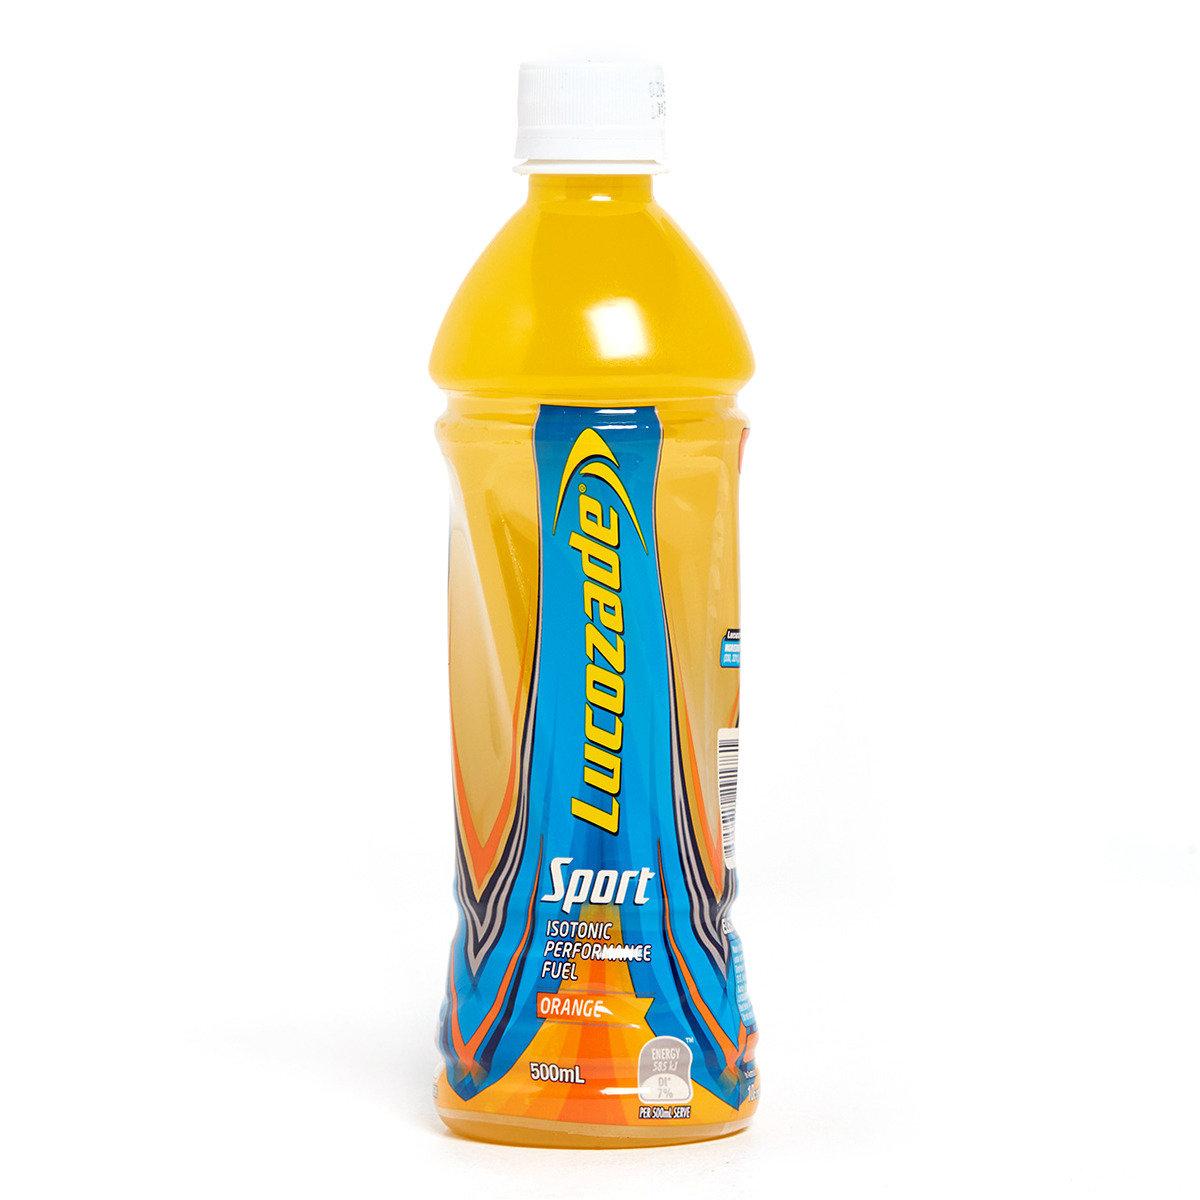 Sport 運動飲品 - 香橙味